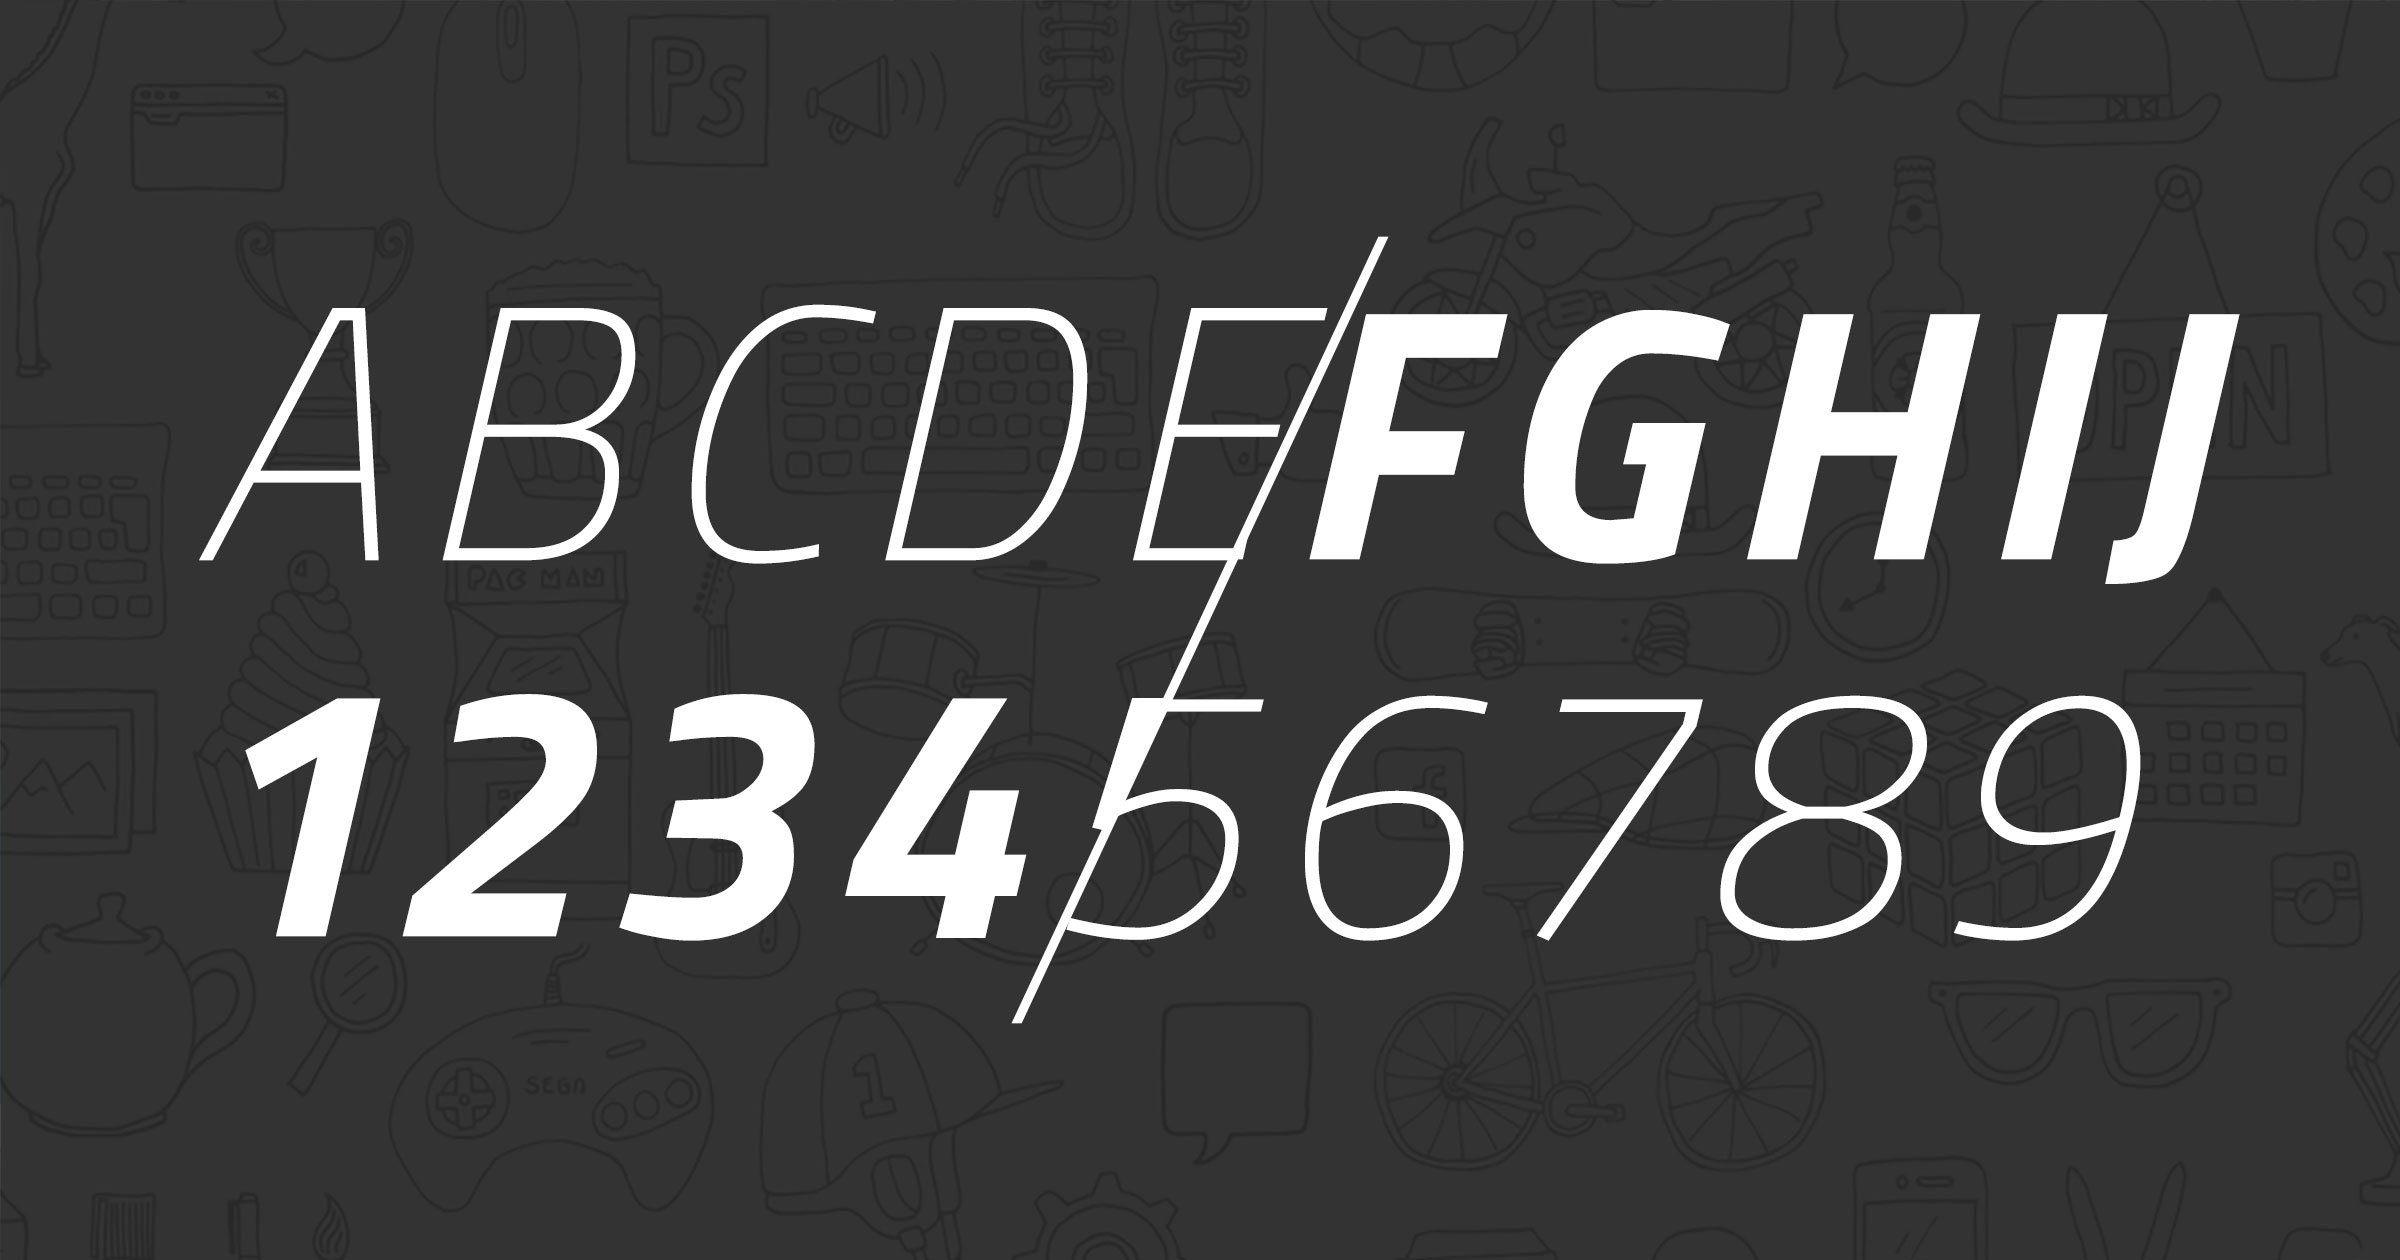 Combining web fonts